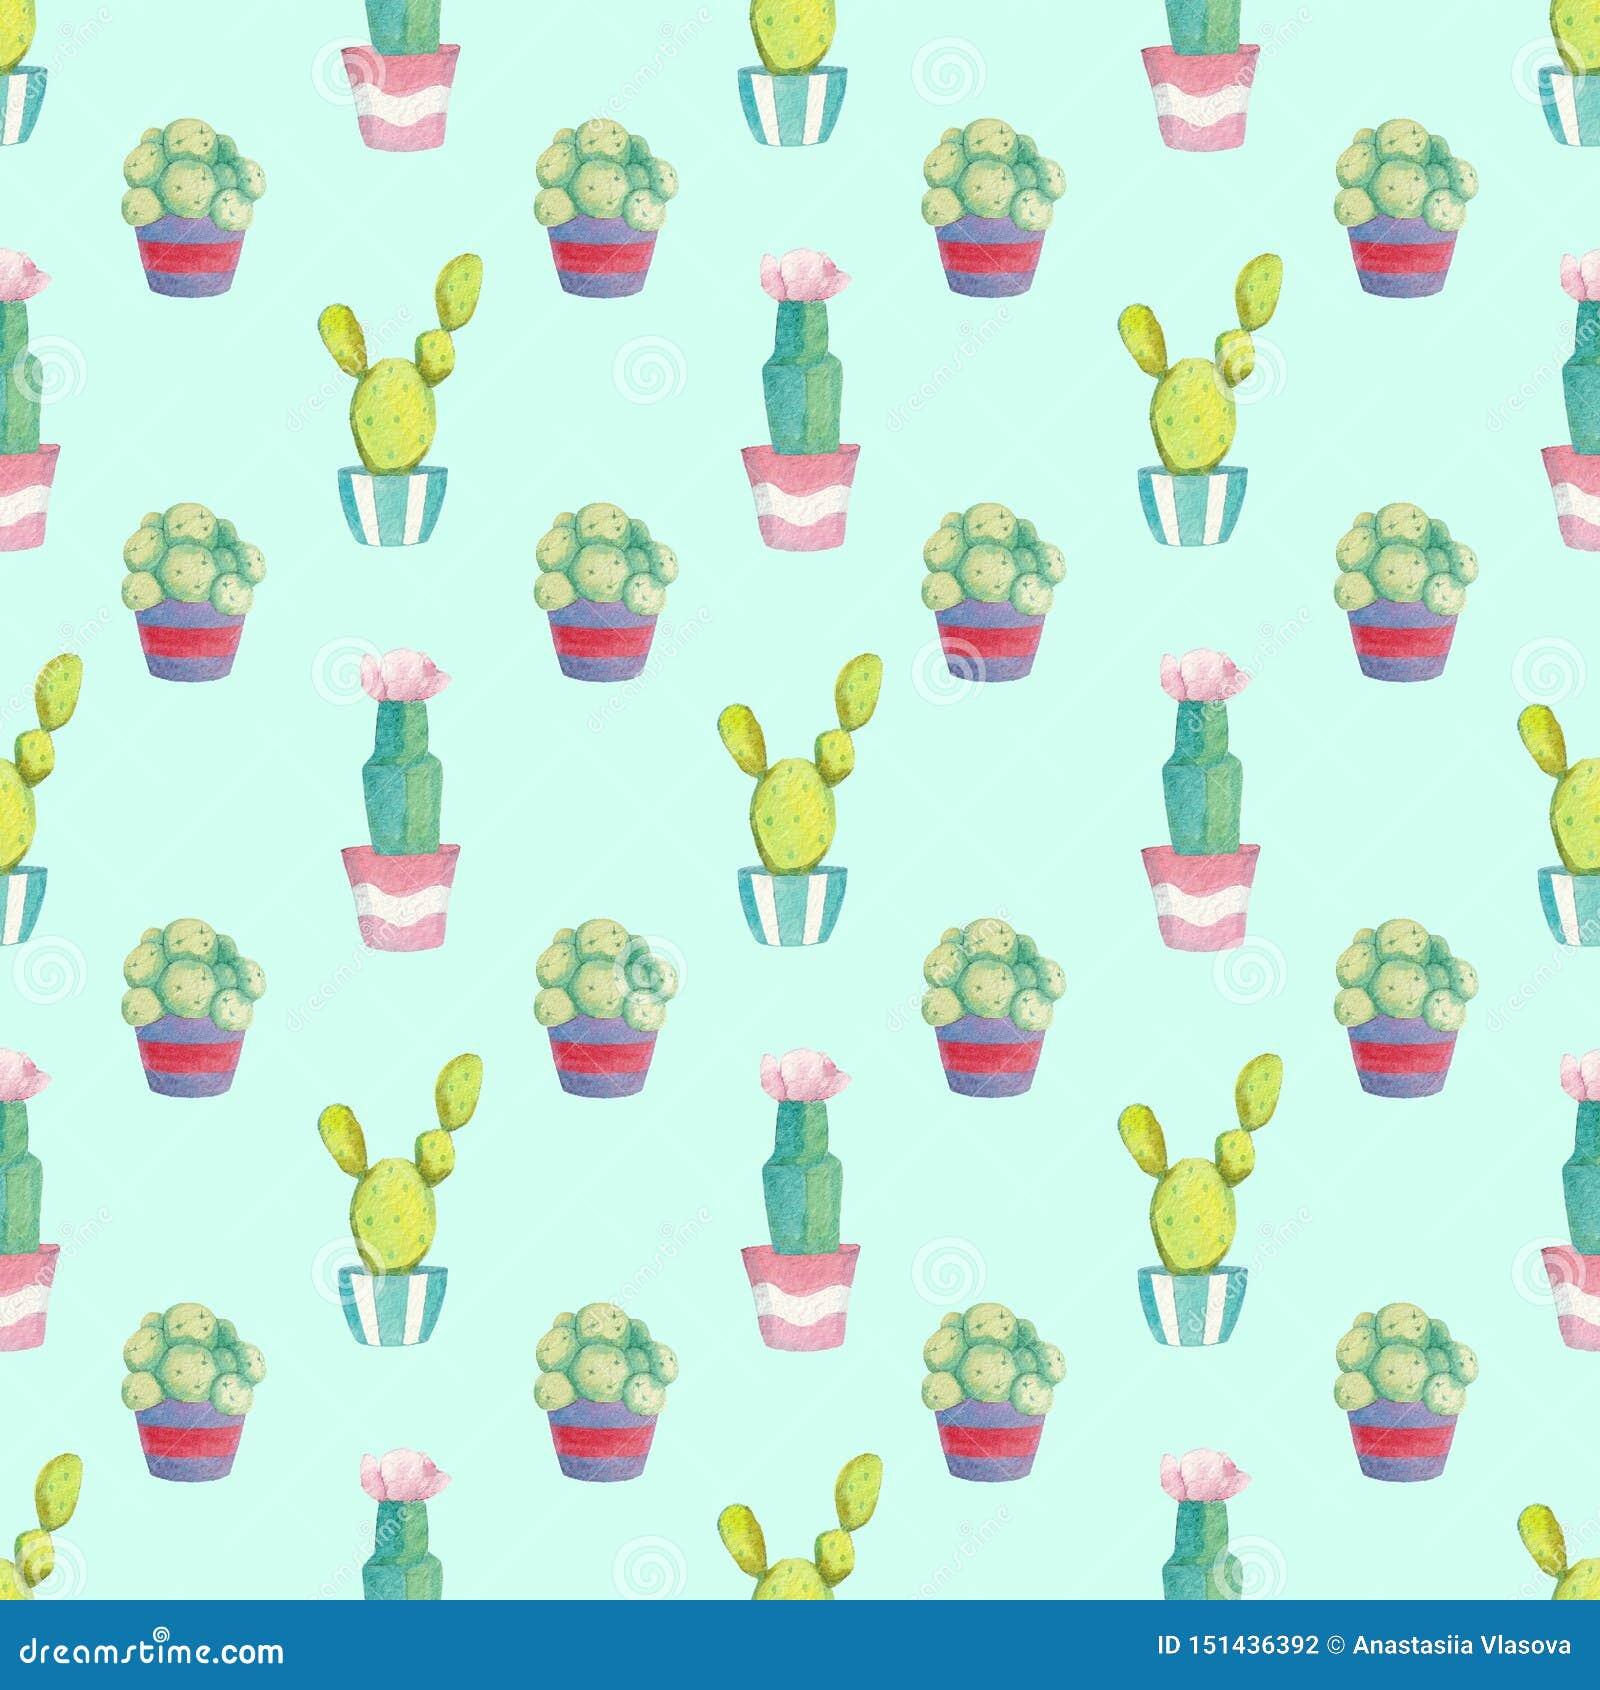 Modello senza cuciture con differenti cactus verdi in di vasi colorati multi